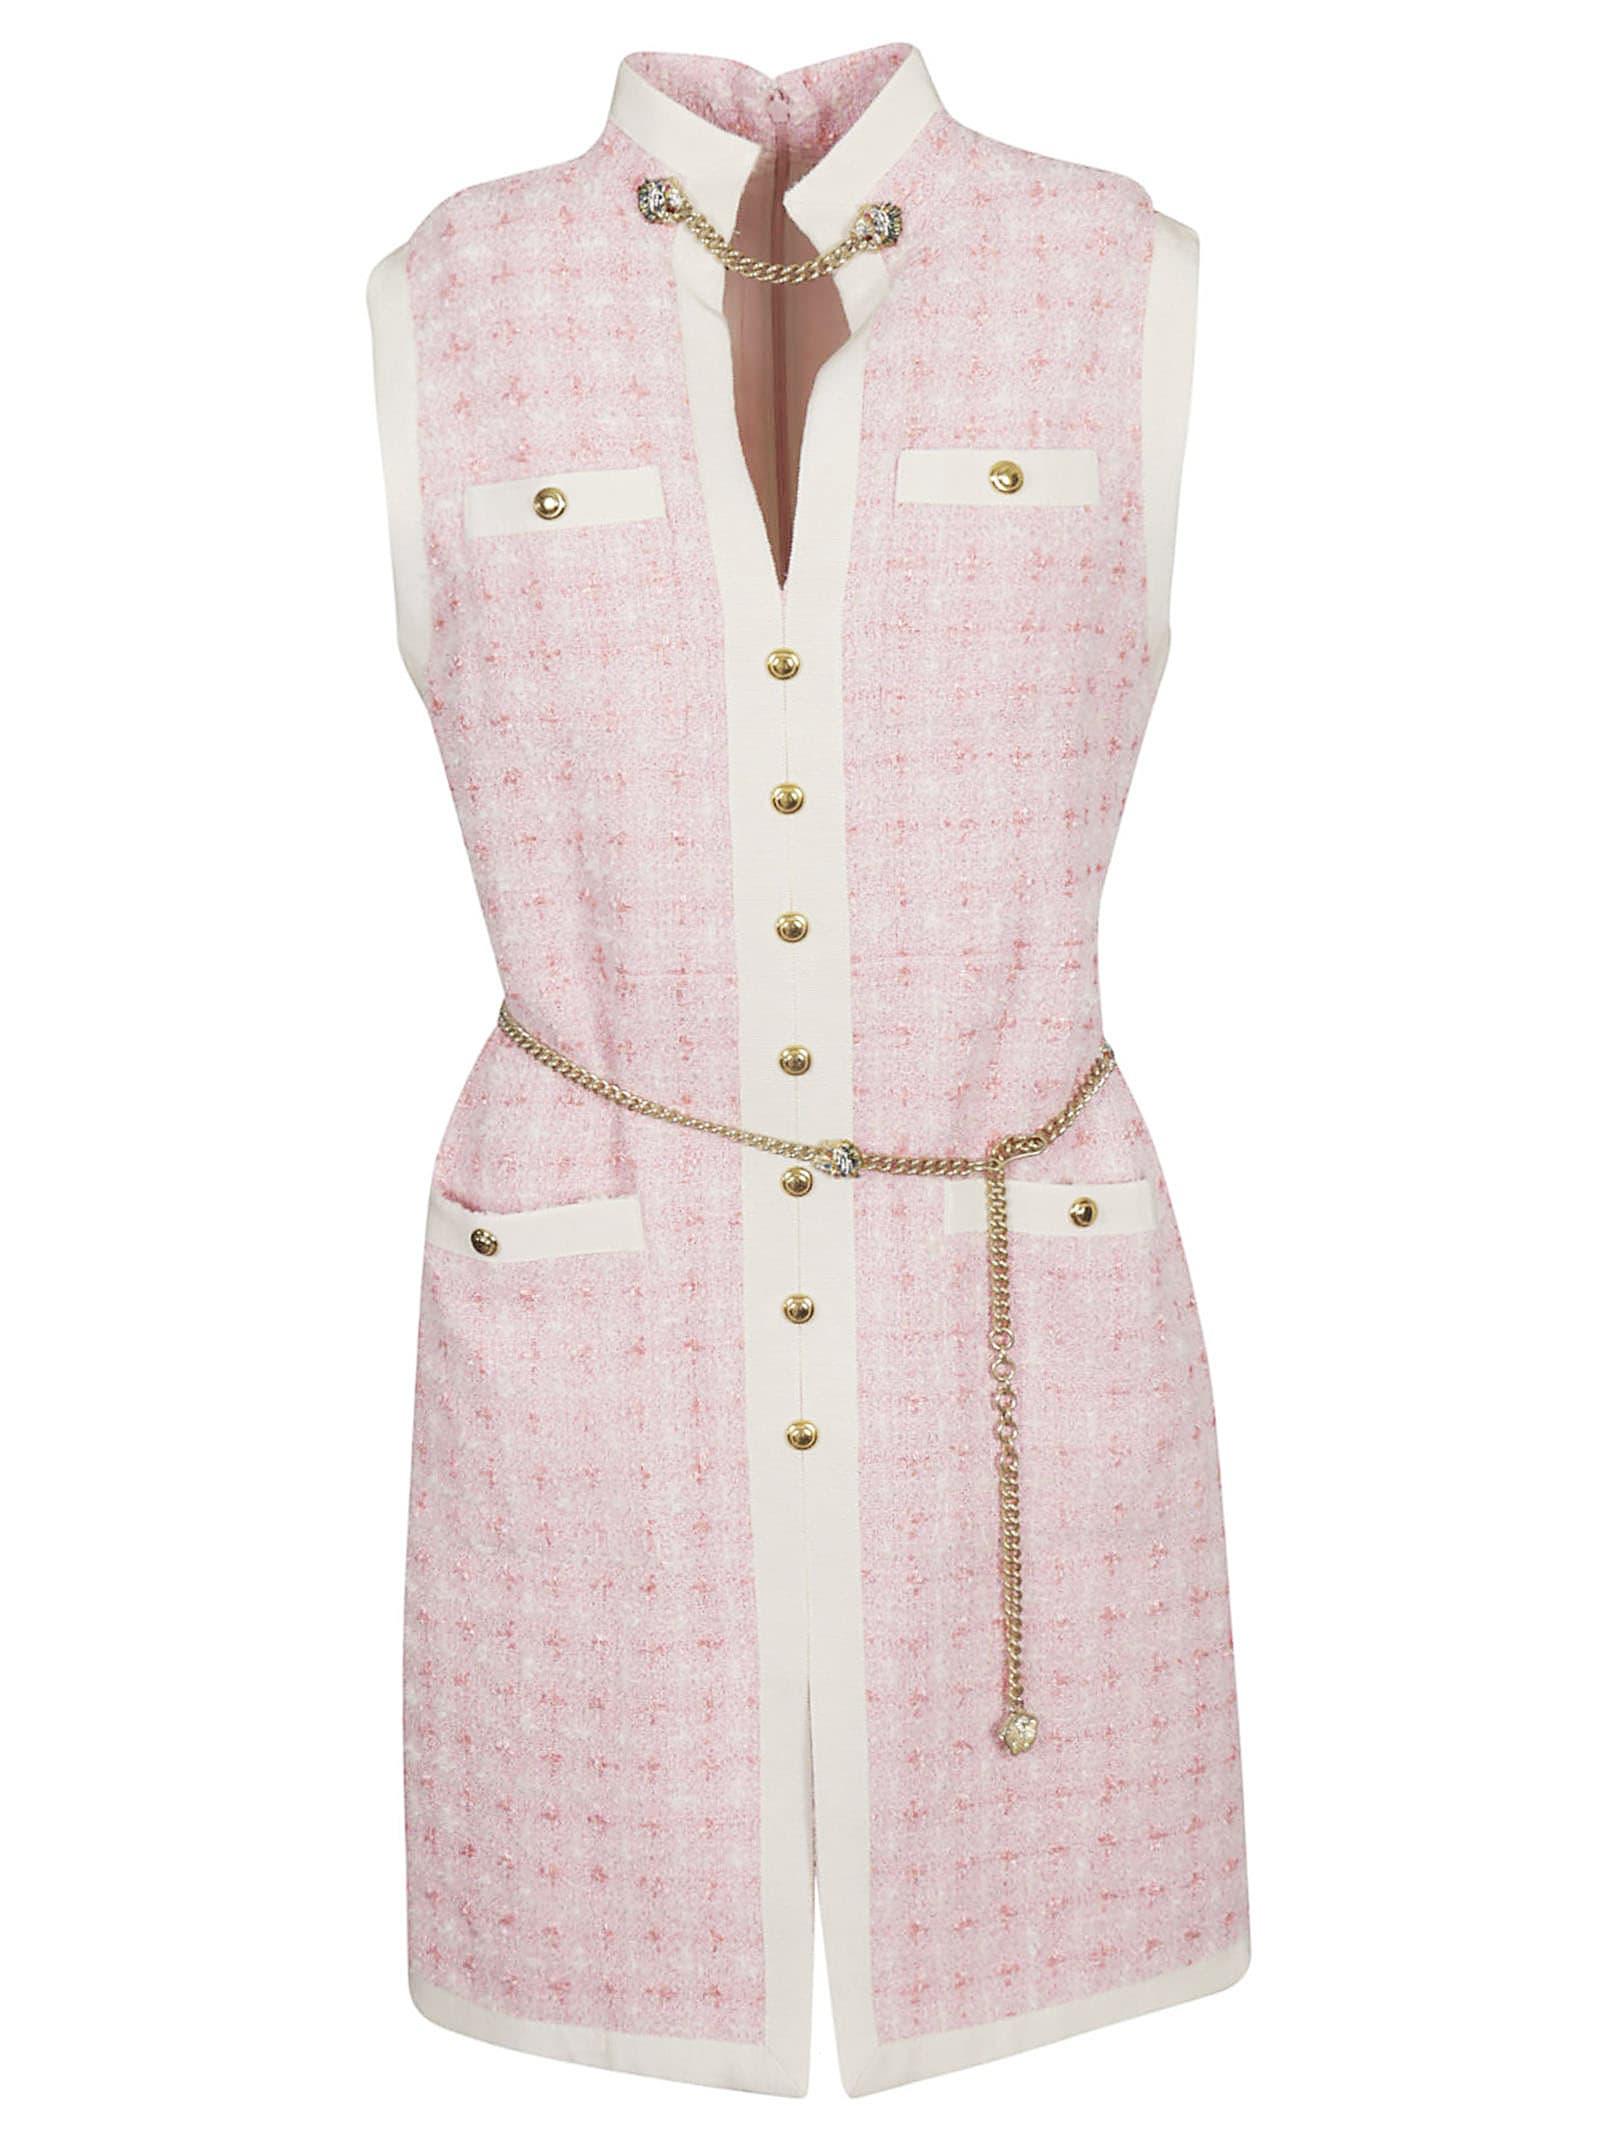 9c32b1c0c Gucci Gucci Tweed Short Dress - Pink - 10920445 | italist